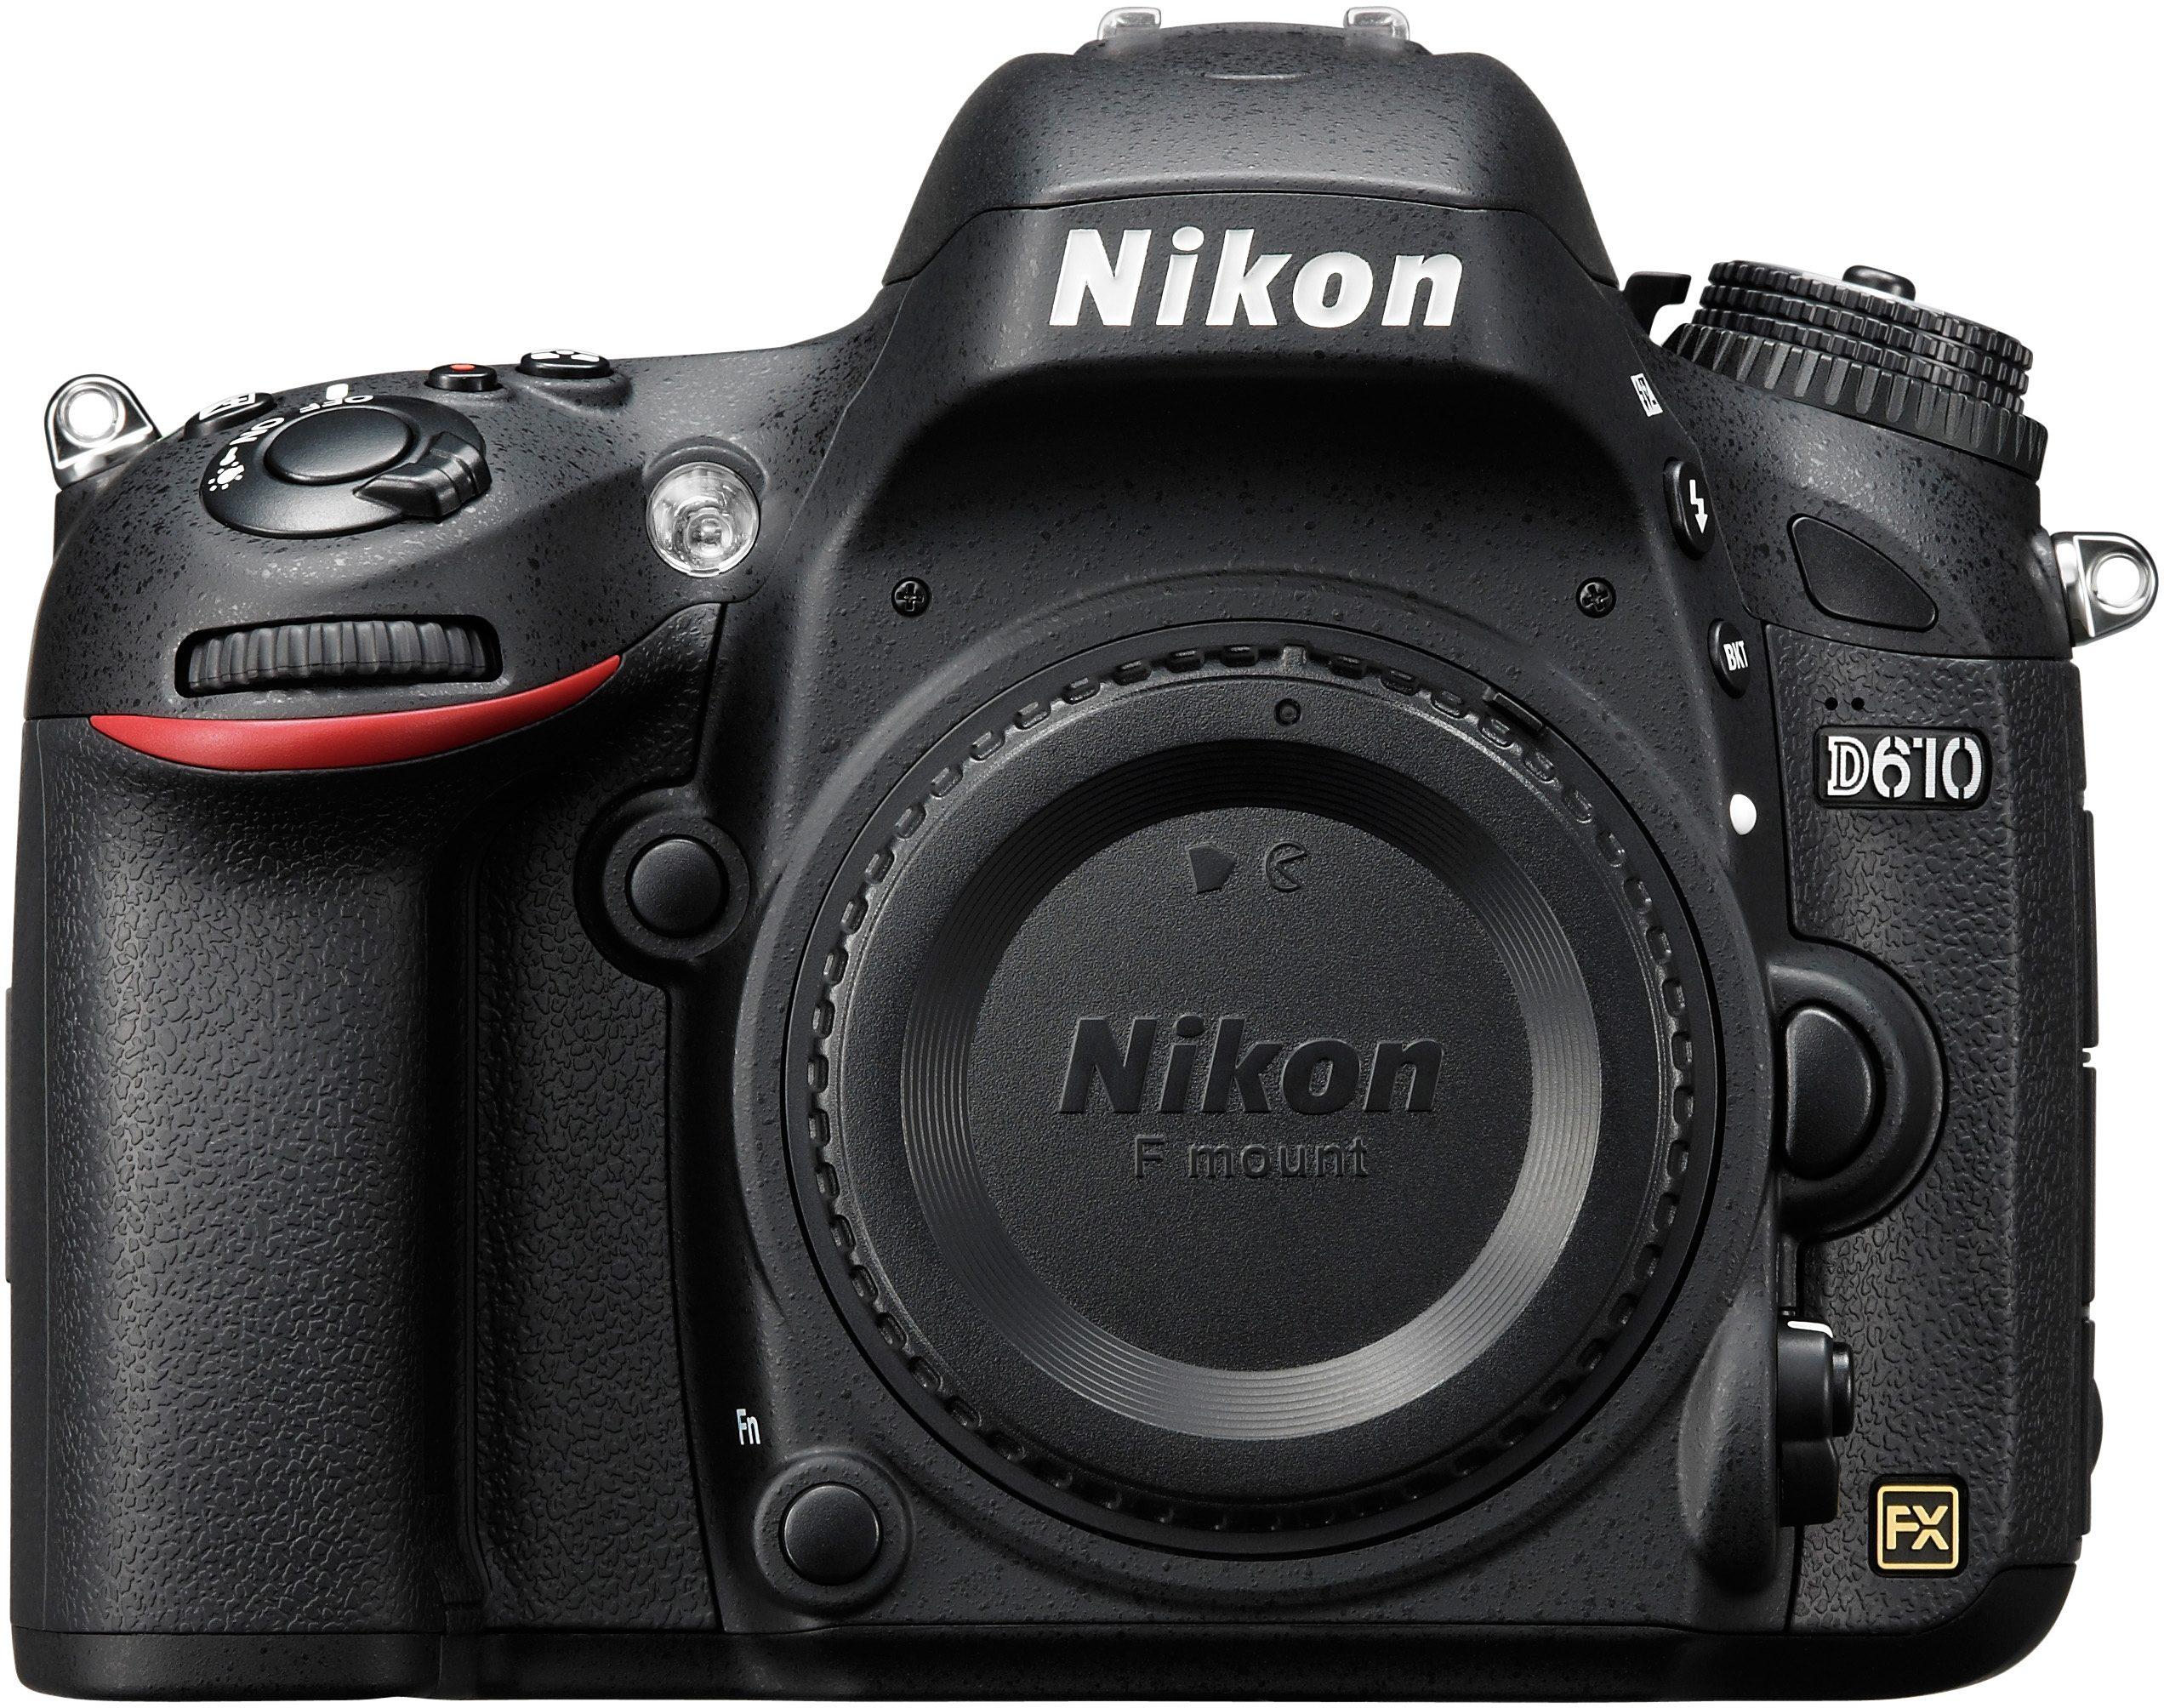 Nikon D610 Body Spiegelreflex Kamera, 24,3 Megapixel, 8 cm (3,2 Zoll) Display